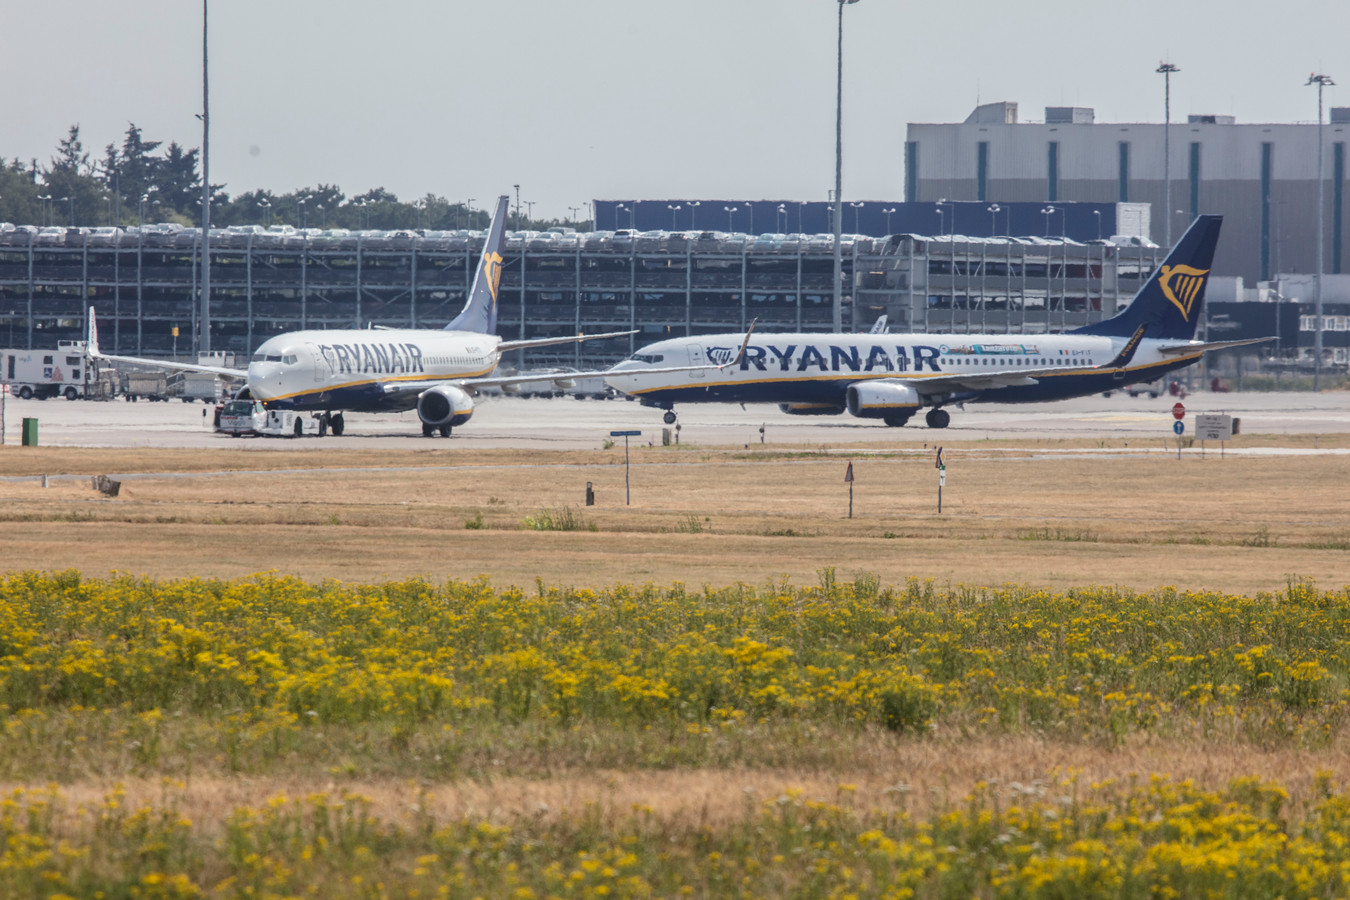 Vliegtuigen van Raynair op Eindhoven Airport